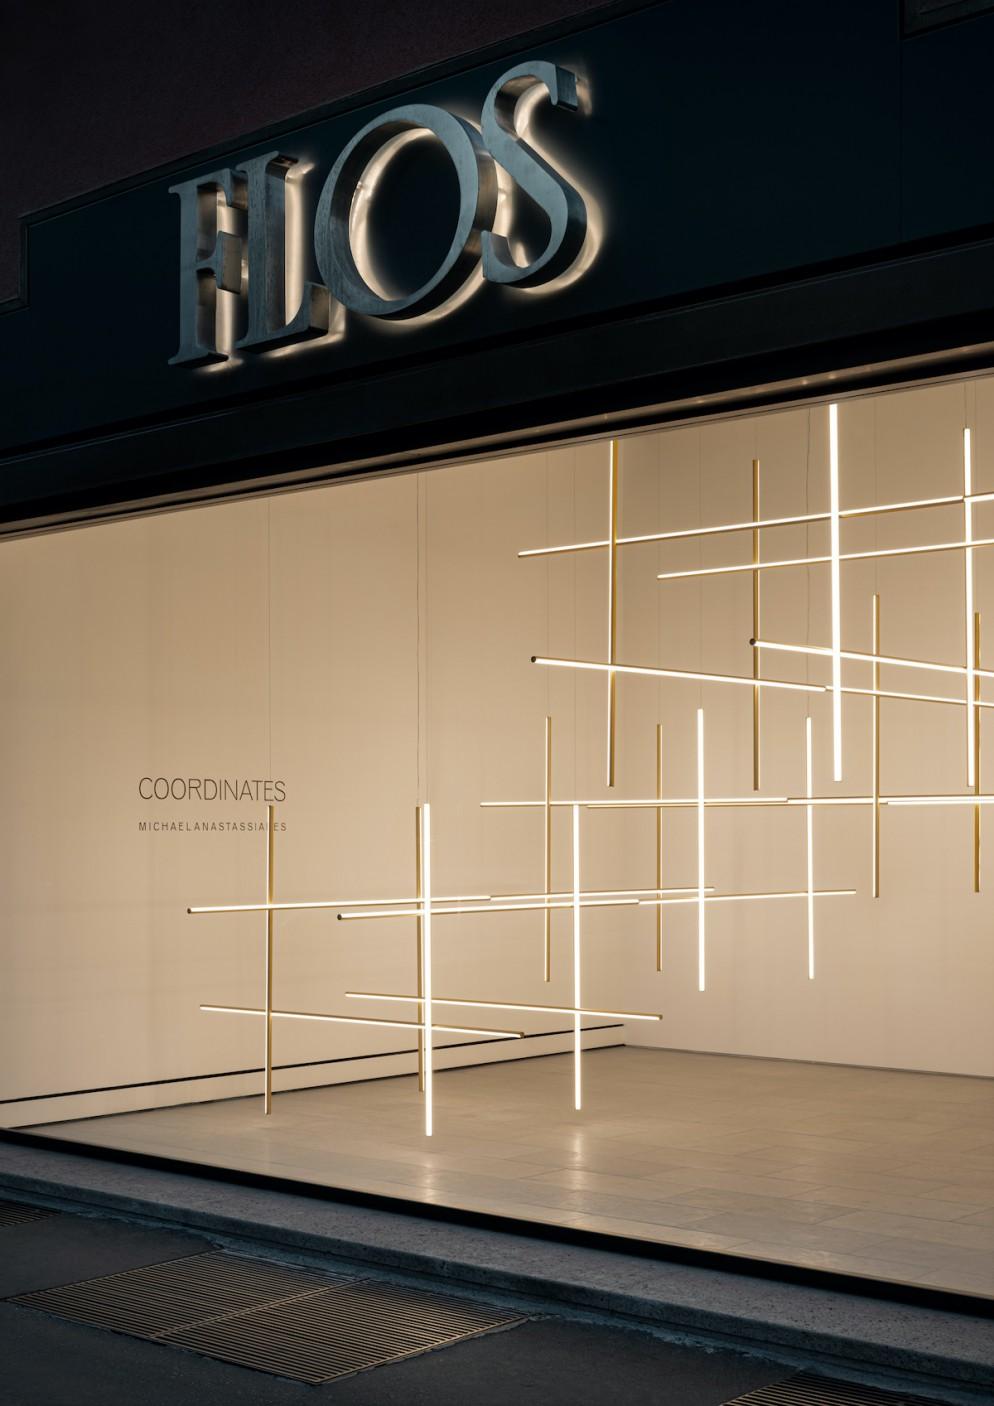 flos-milano-design-city-2020-living-corriere